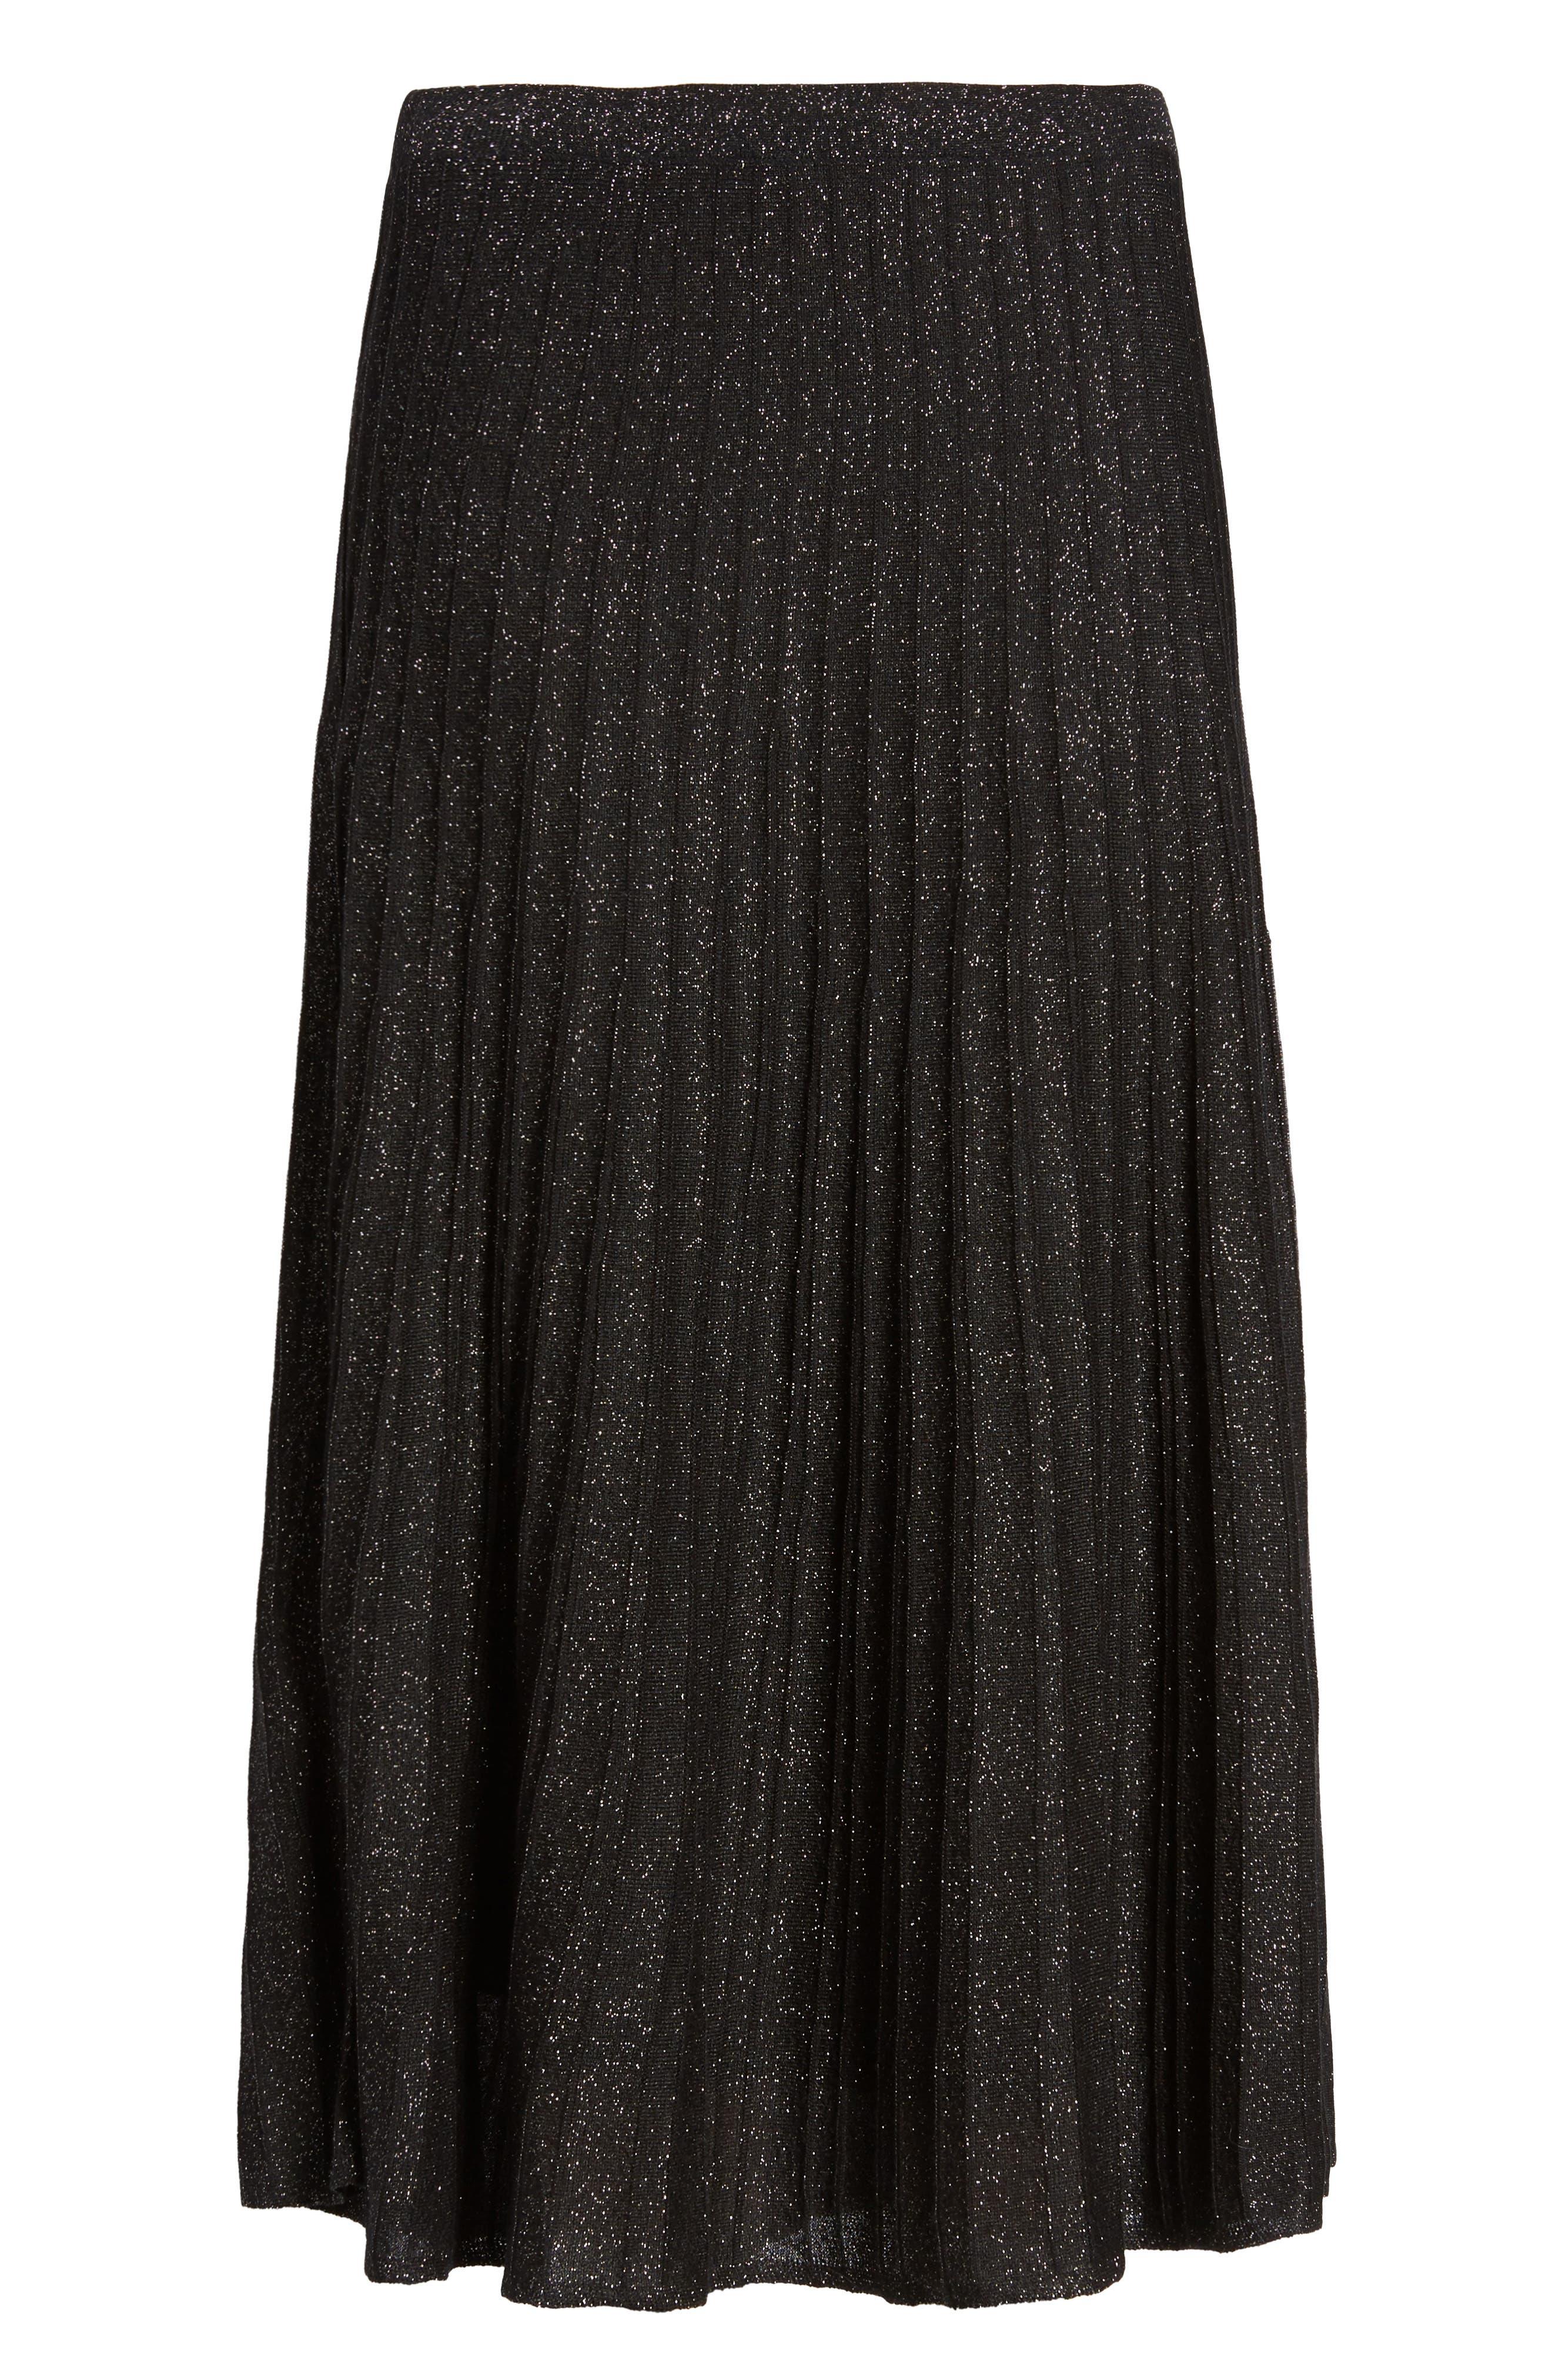 Luminary Pleated Midi Skirt,                             Alternate thumbnail 6, color,